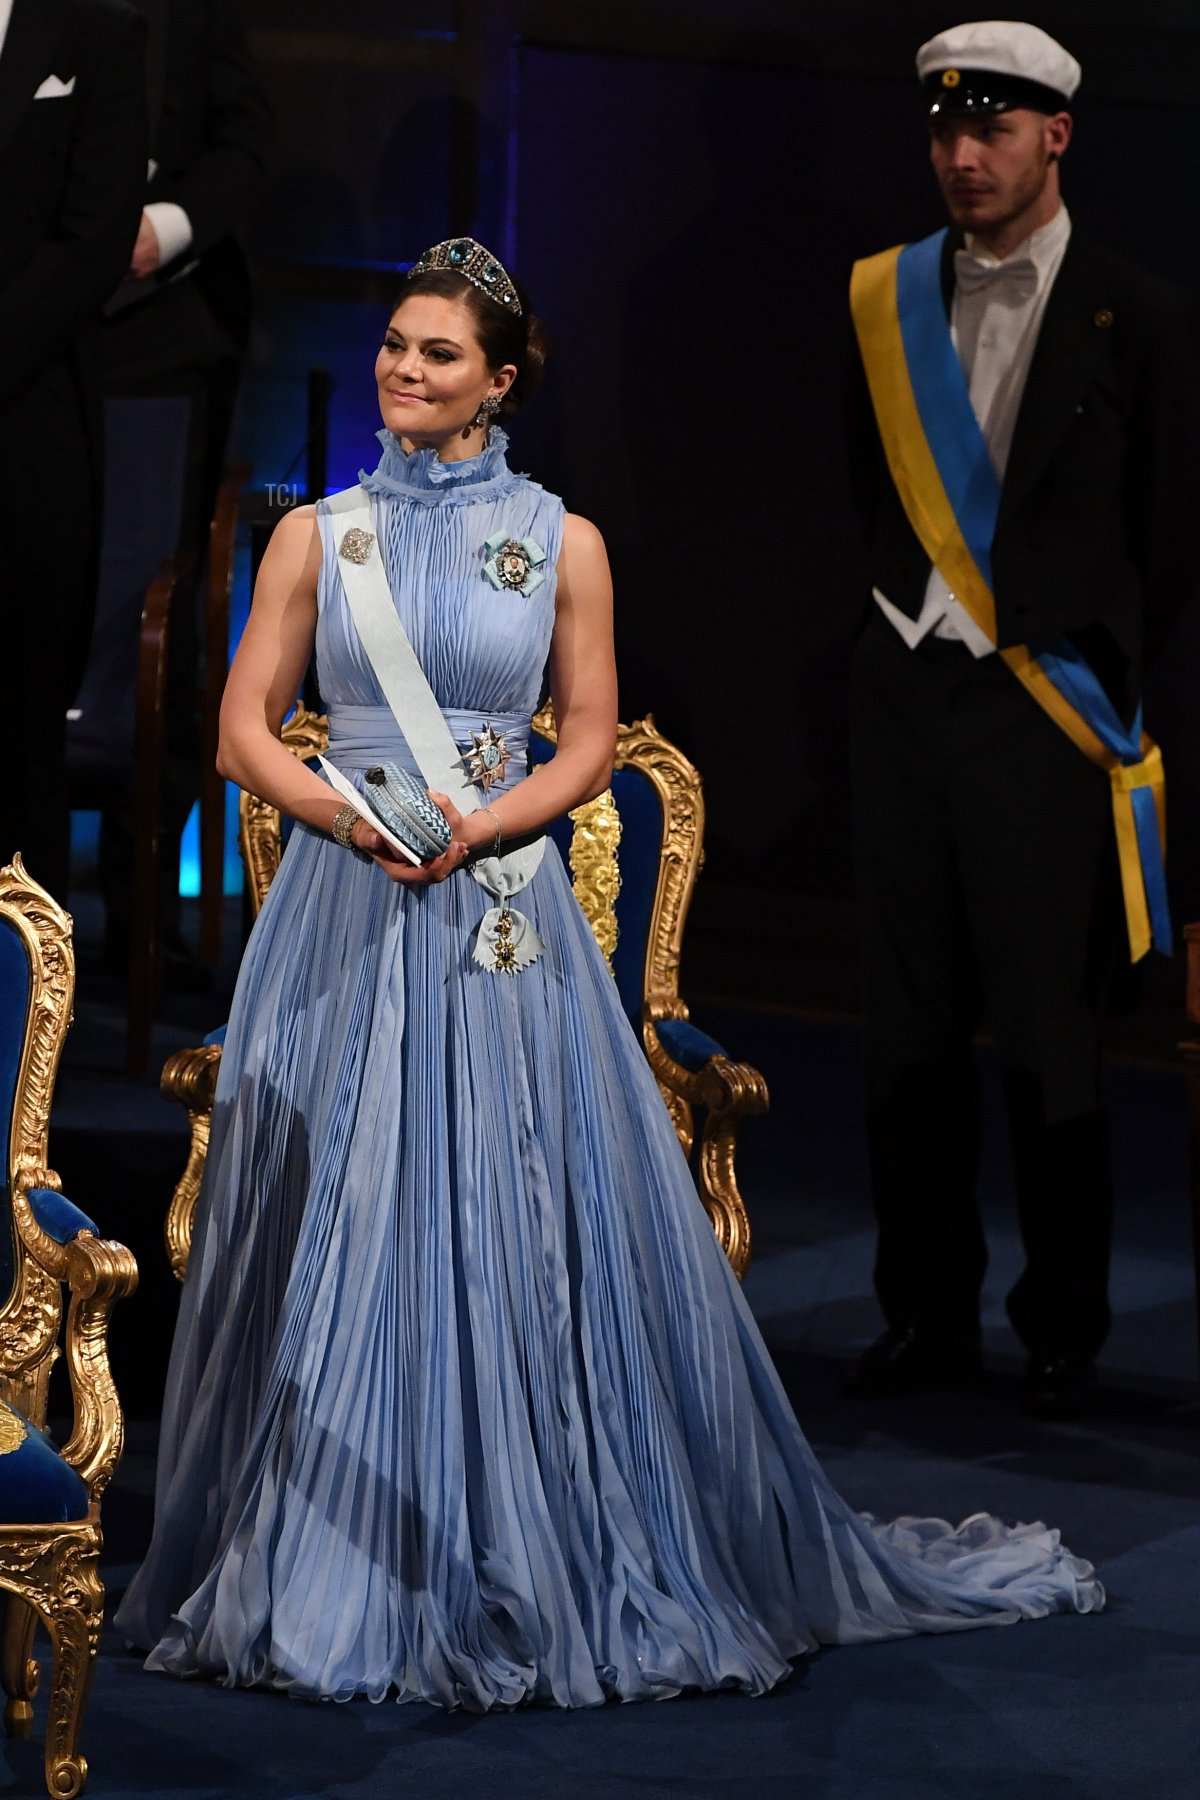 Crown Princess Victoria of Sweden attends the Nobel Prize Awards Ceremony and Banquet on December 10, 2017 in Stockholm, Sweden